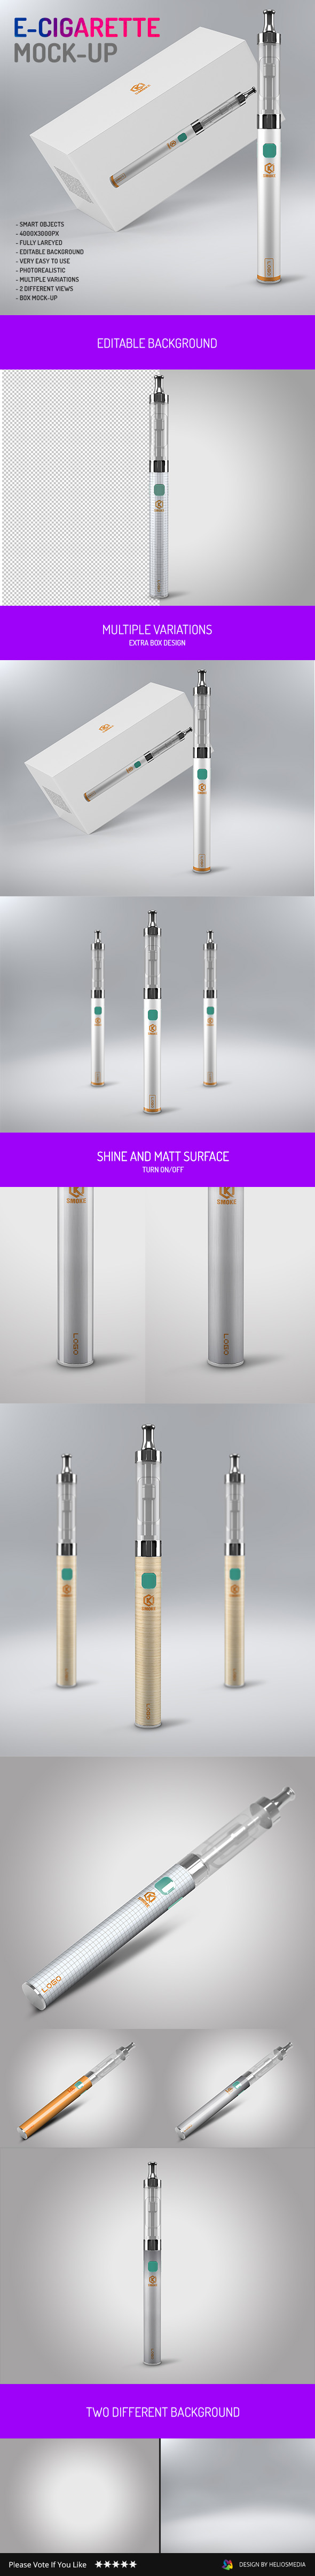 box cigar e-cigarette mat Mockup Multipurpose shine smoke studio